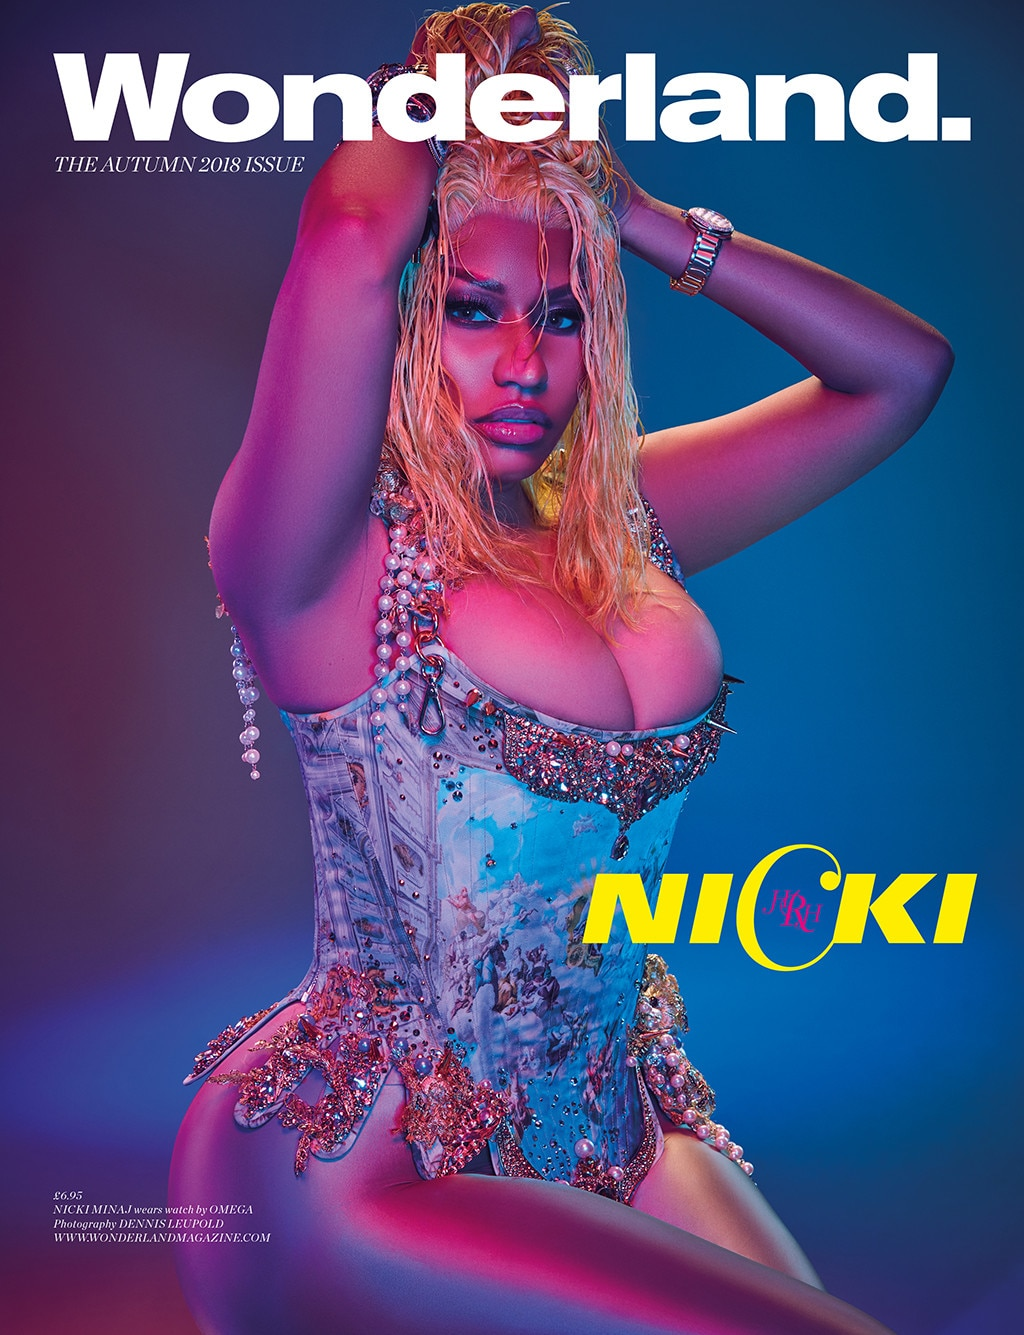 Nicki minaj poster sexy